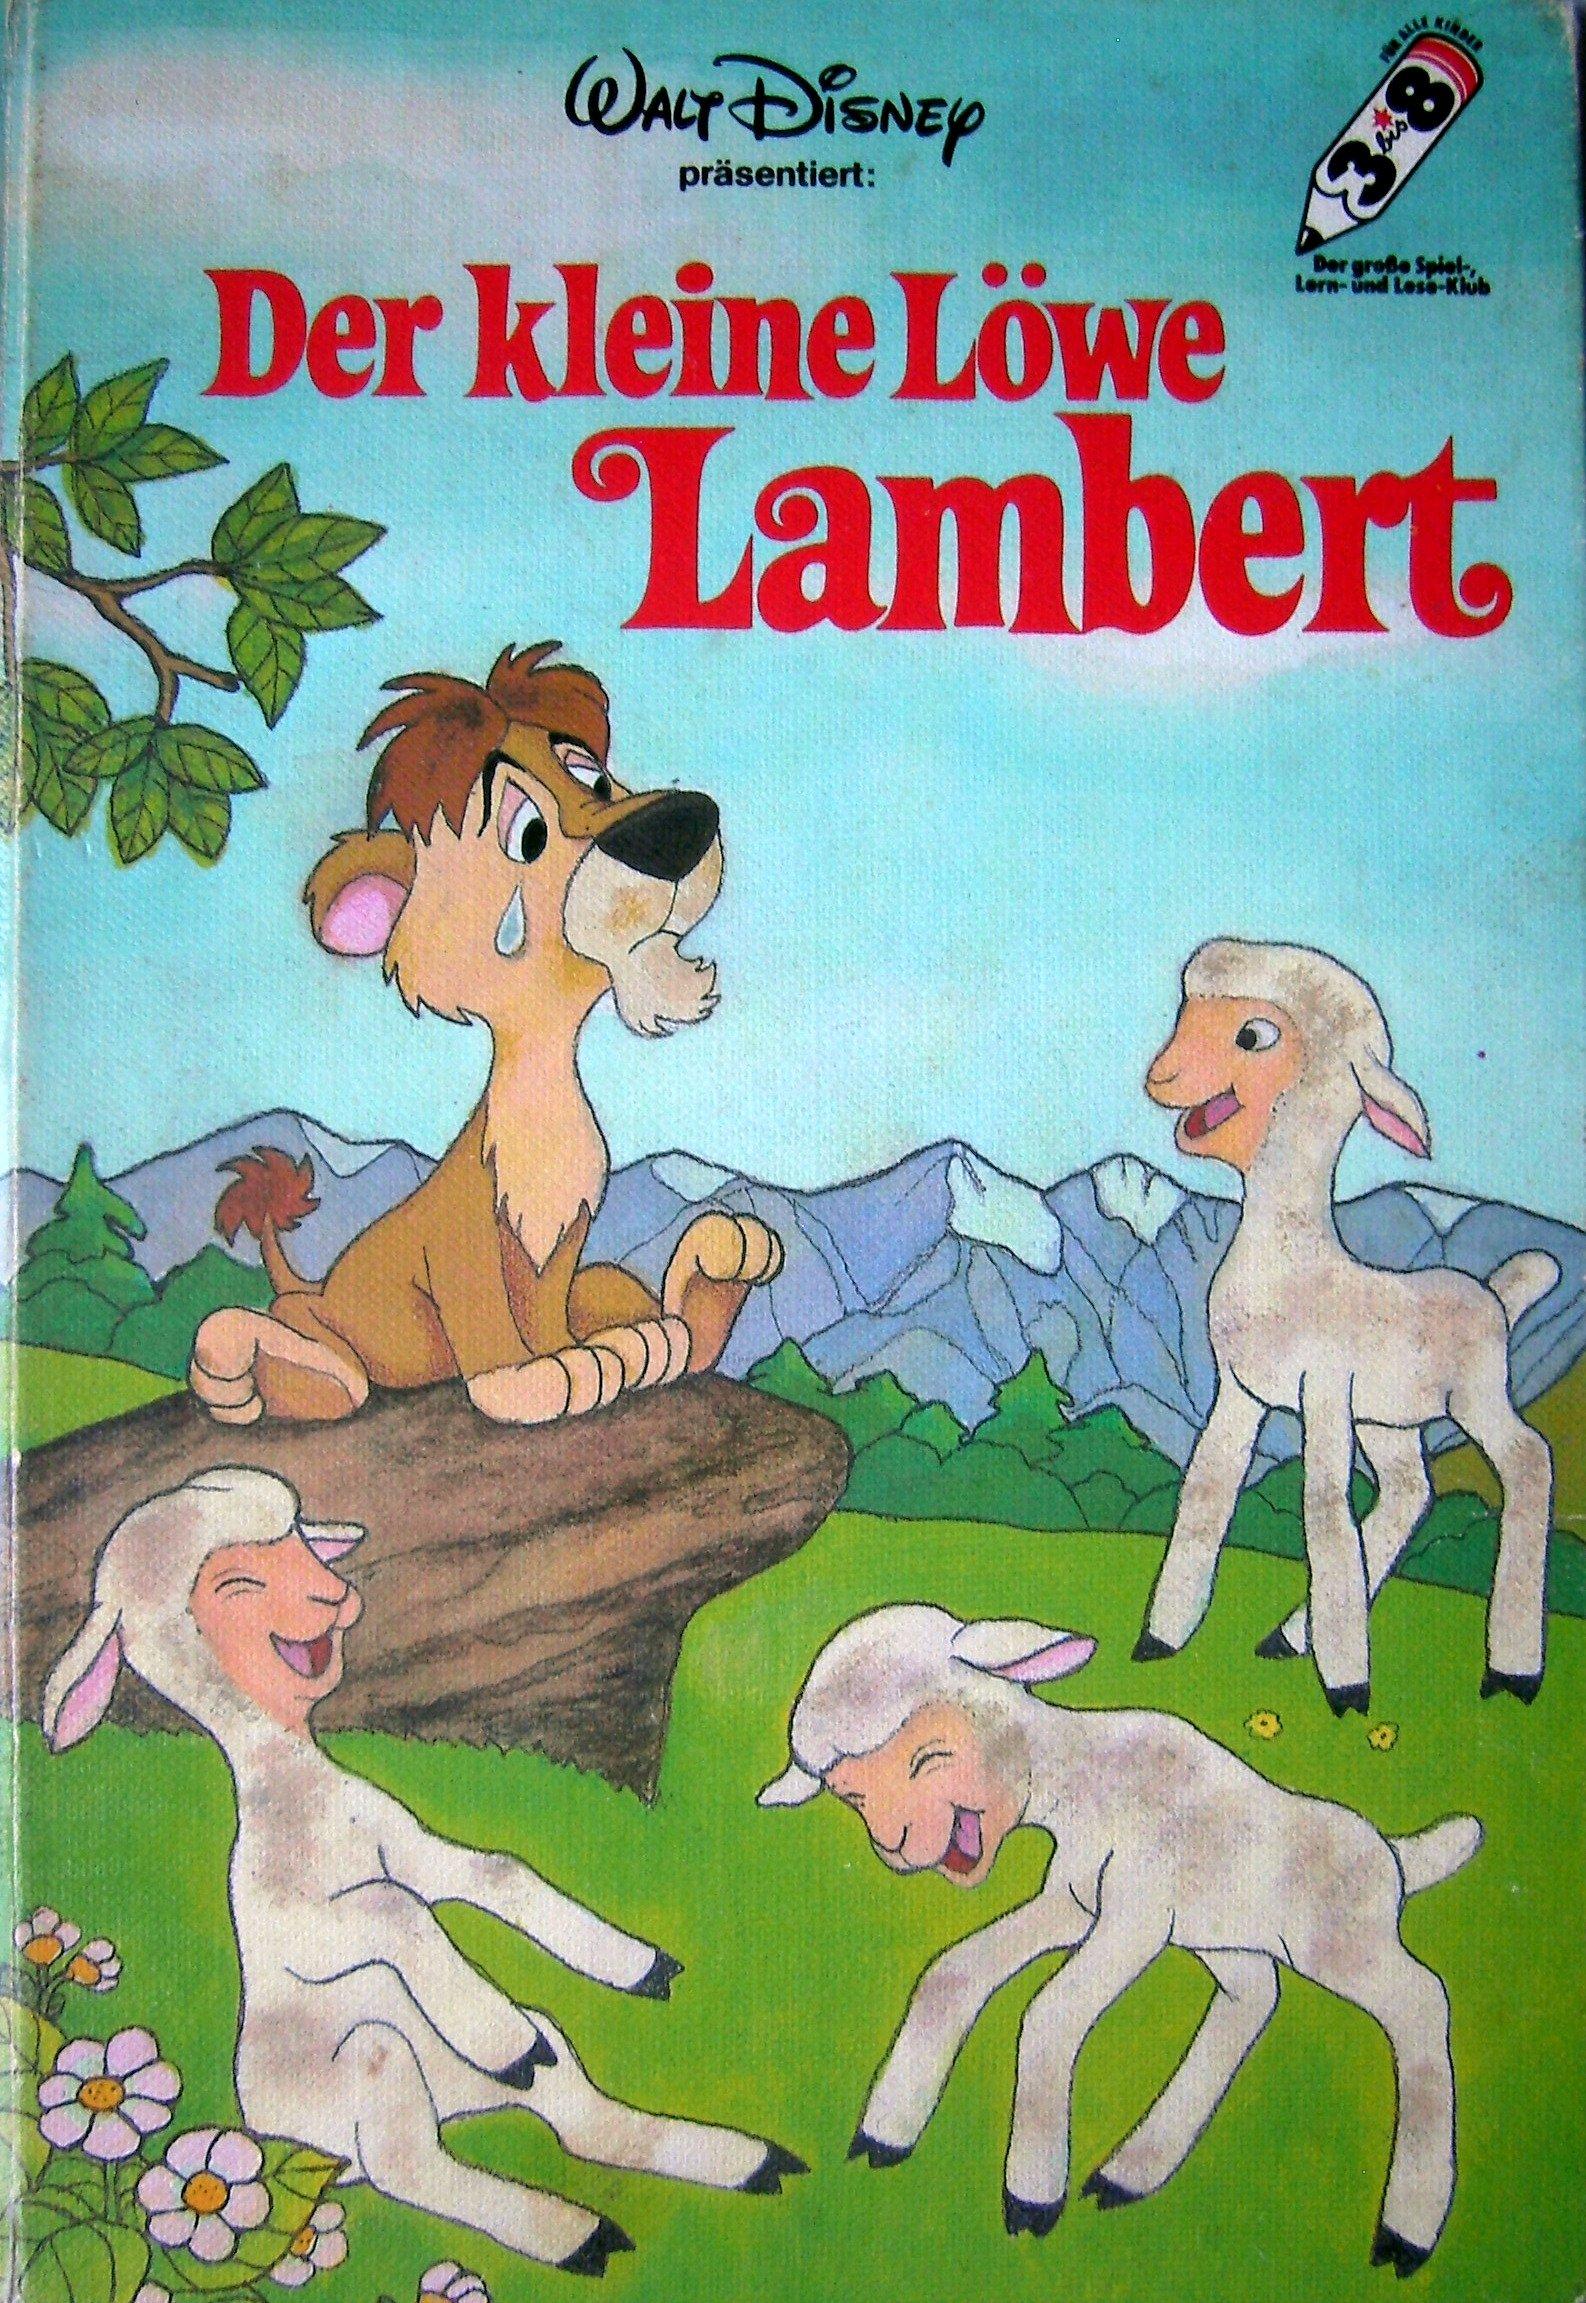 Der kleine Löwe Lambert: Amazon.de: Walt Disney: Bücher